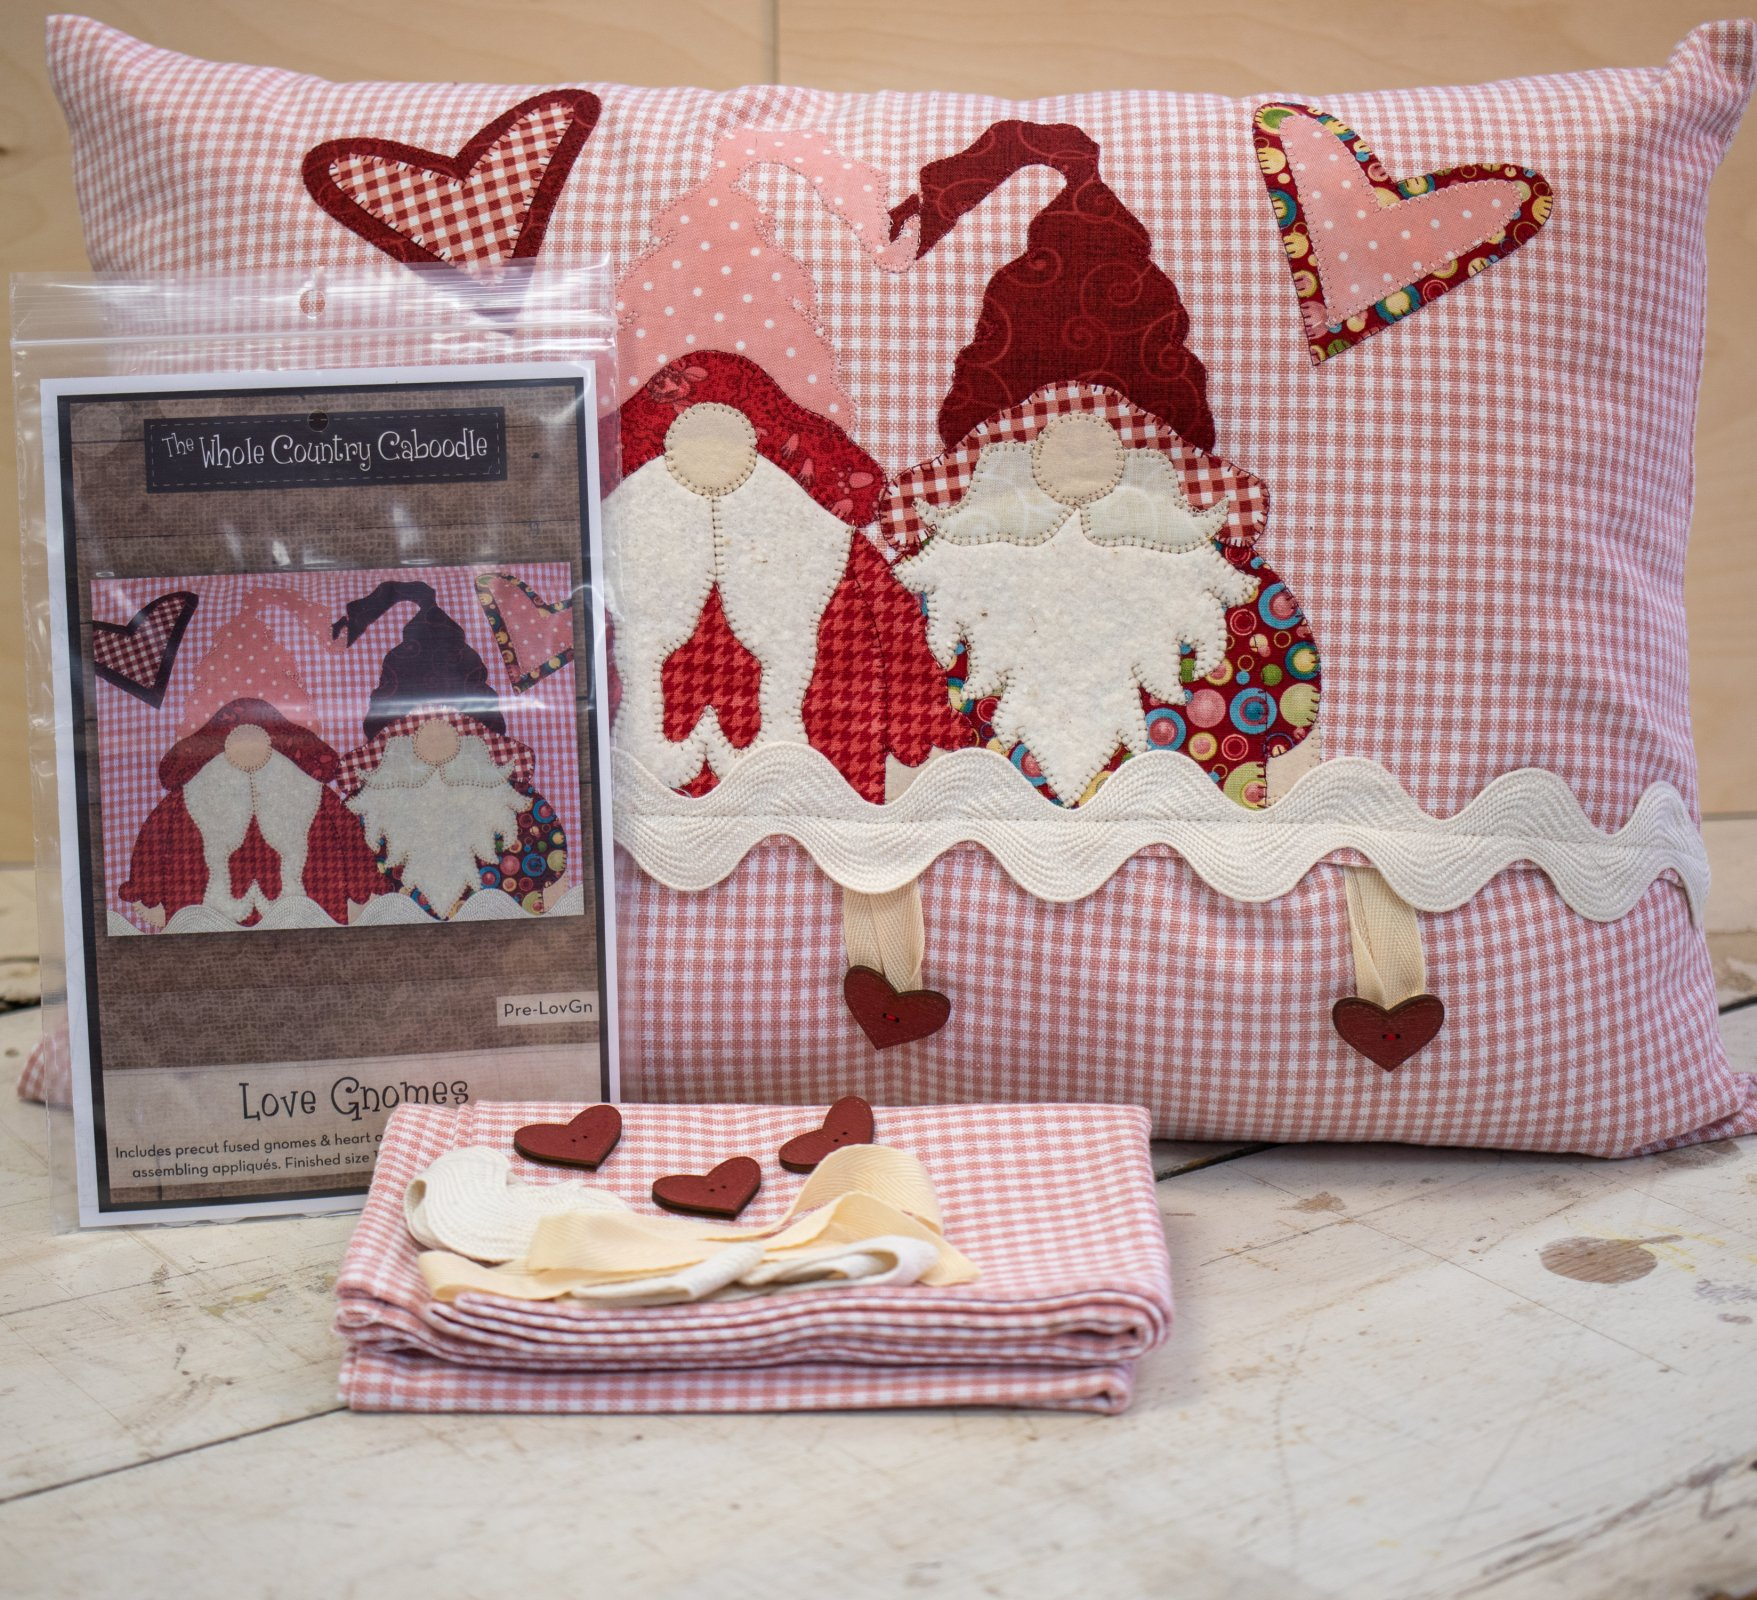 Love Gnomes Applique Pillow Cover Kit